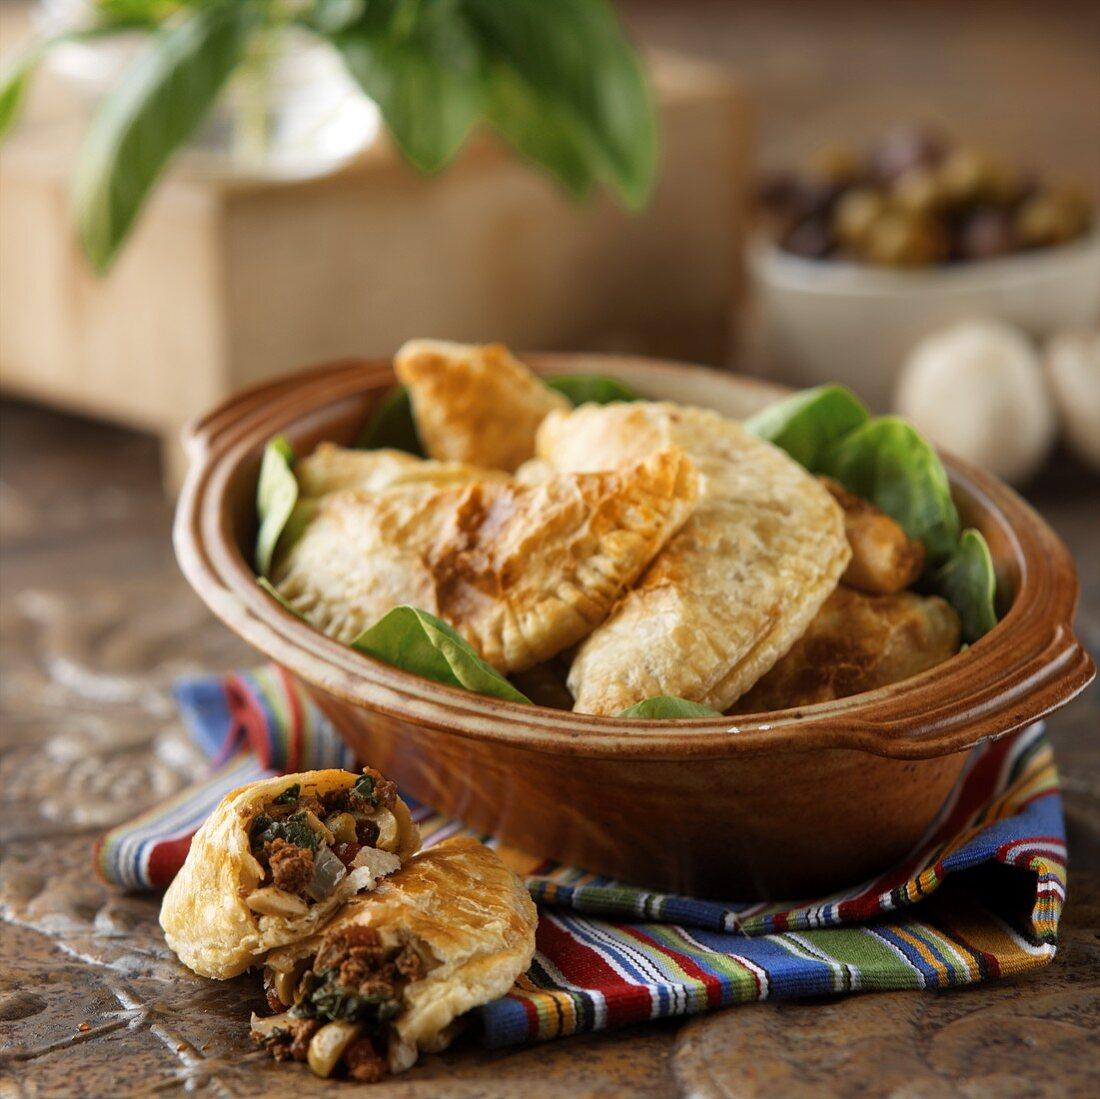 Empanadas Served in a Ceramic Crock; One Broken in Half